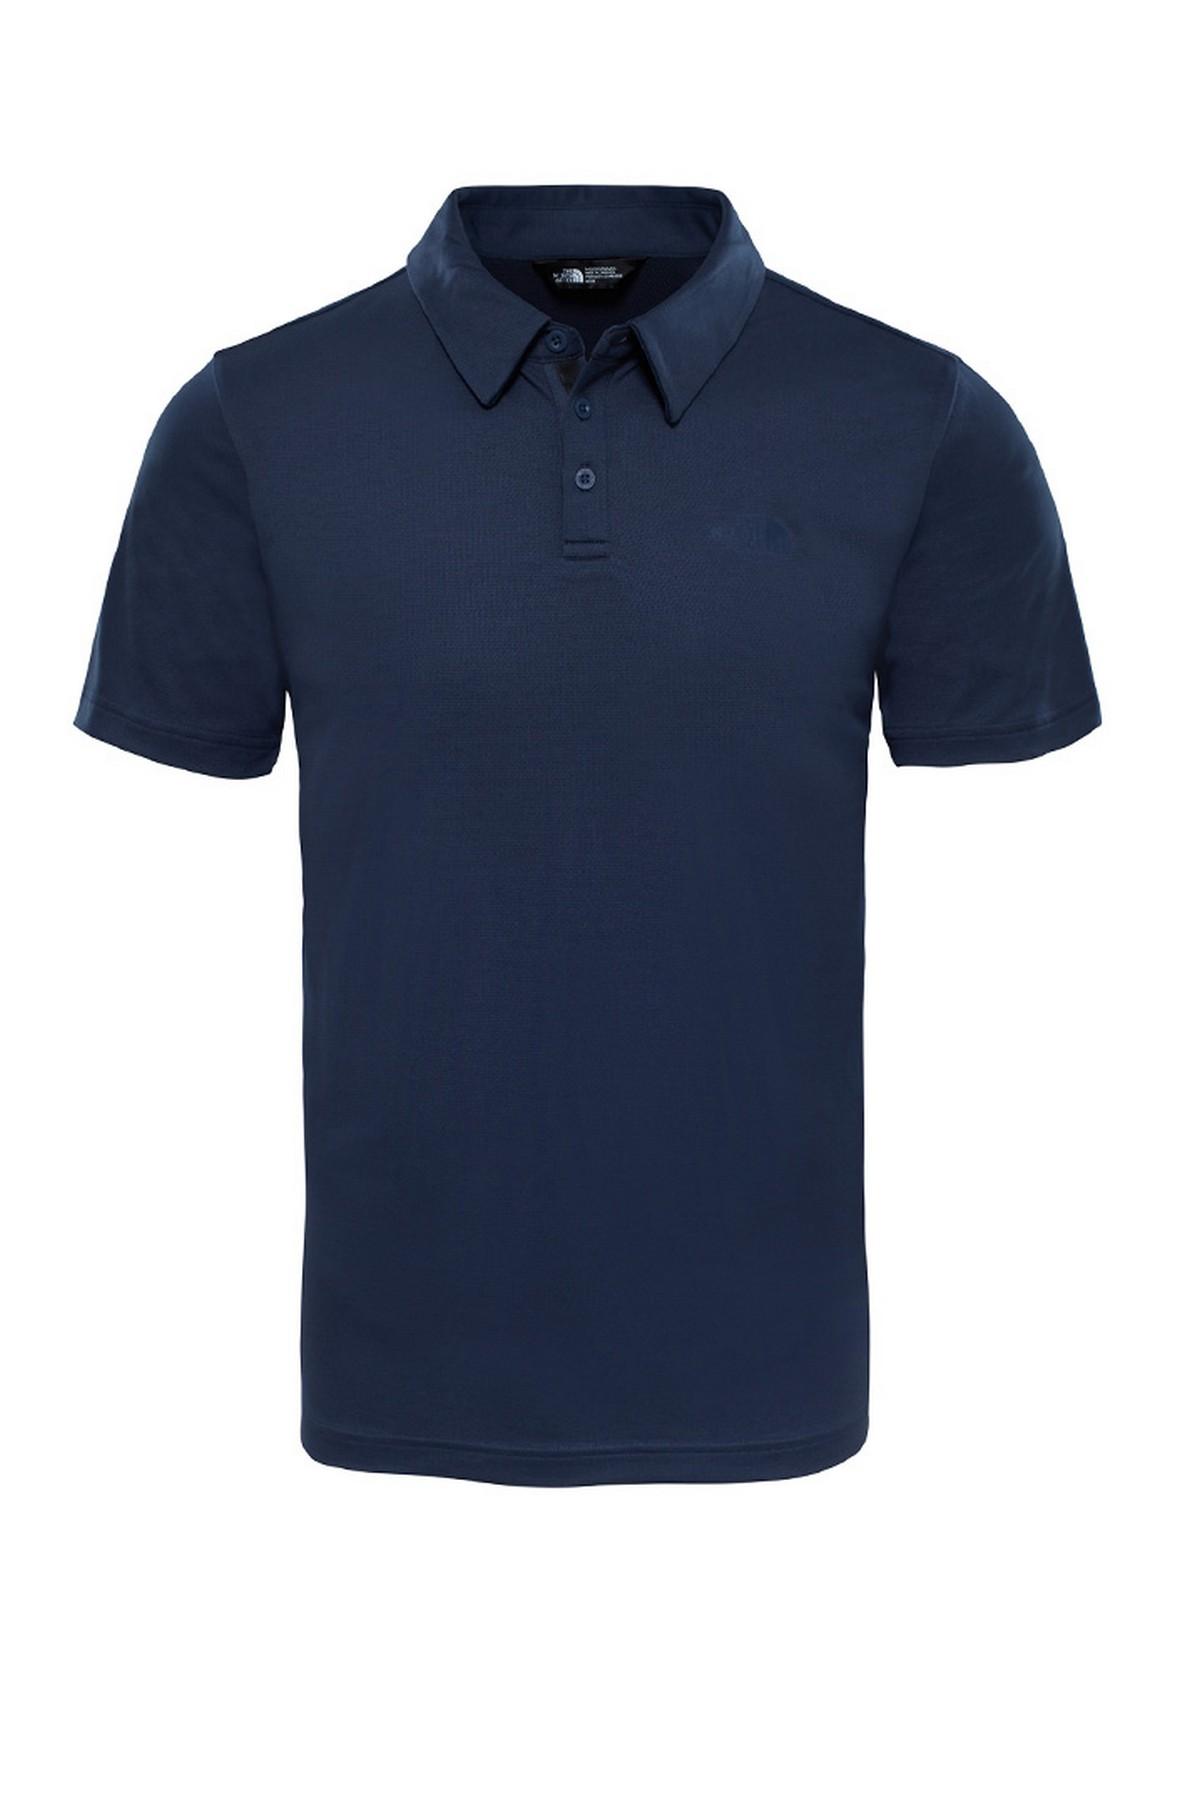 The North Face Erkek Polo T-Shirt Lacivert (NF0A2WAZH2G)